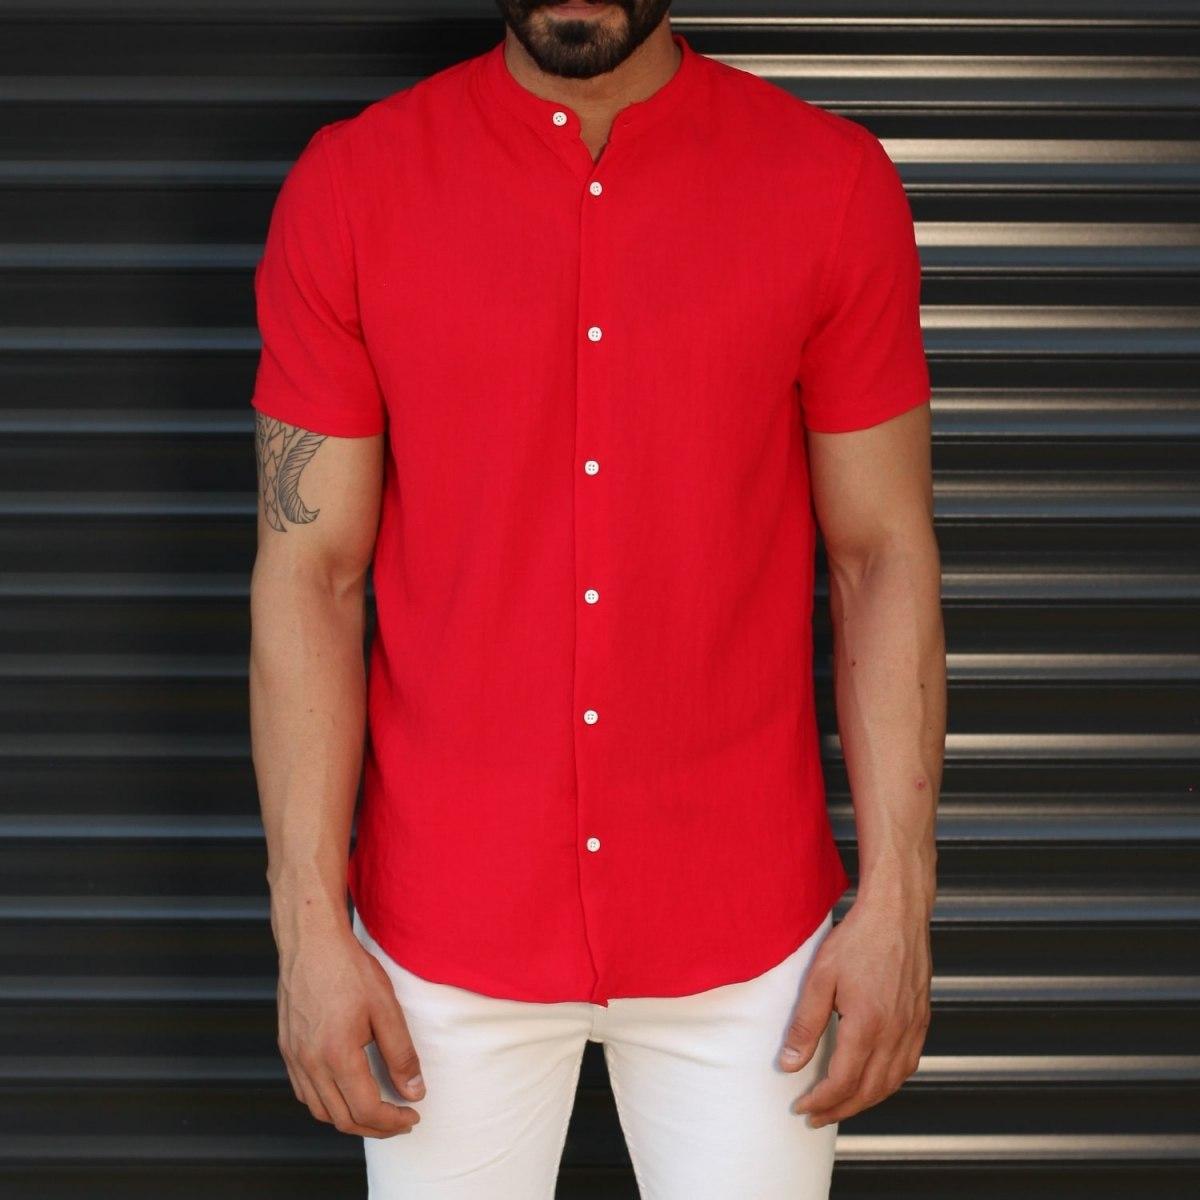 Men's Short Sleeve Grandad Collar Fit Shirt In Red